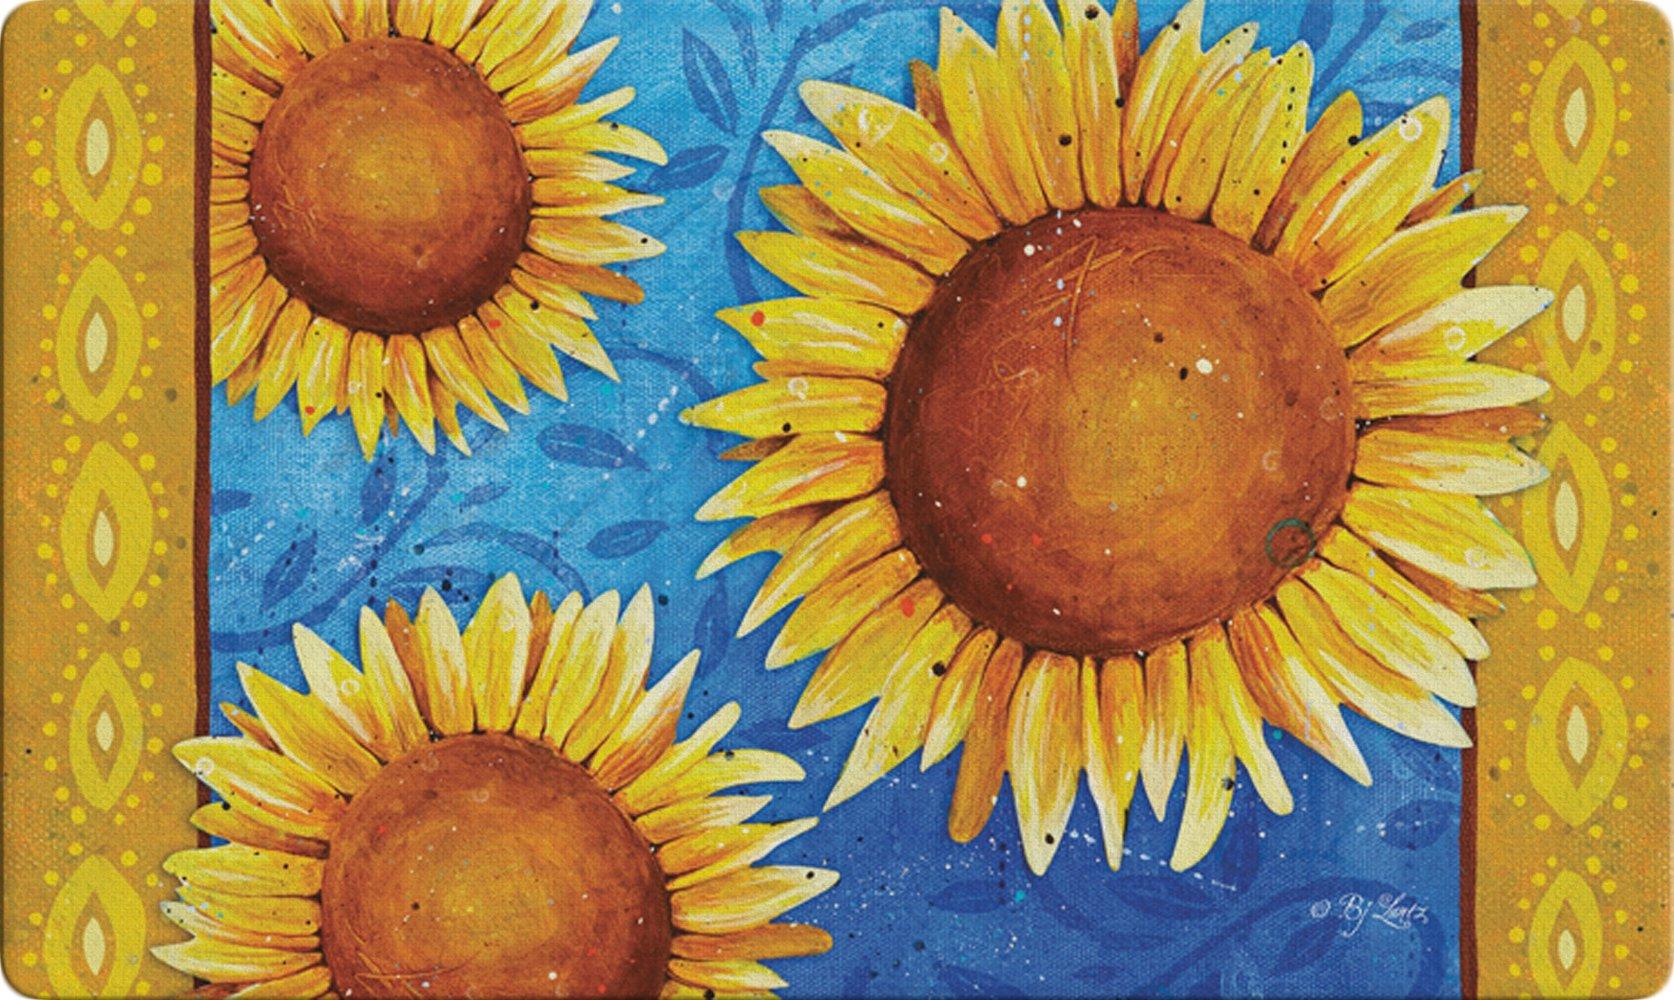 Toland Home Garden Sweet Sunflowers 18 x 30 Inch Decorative Floral Floor Mat Colorful Flower Doormat